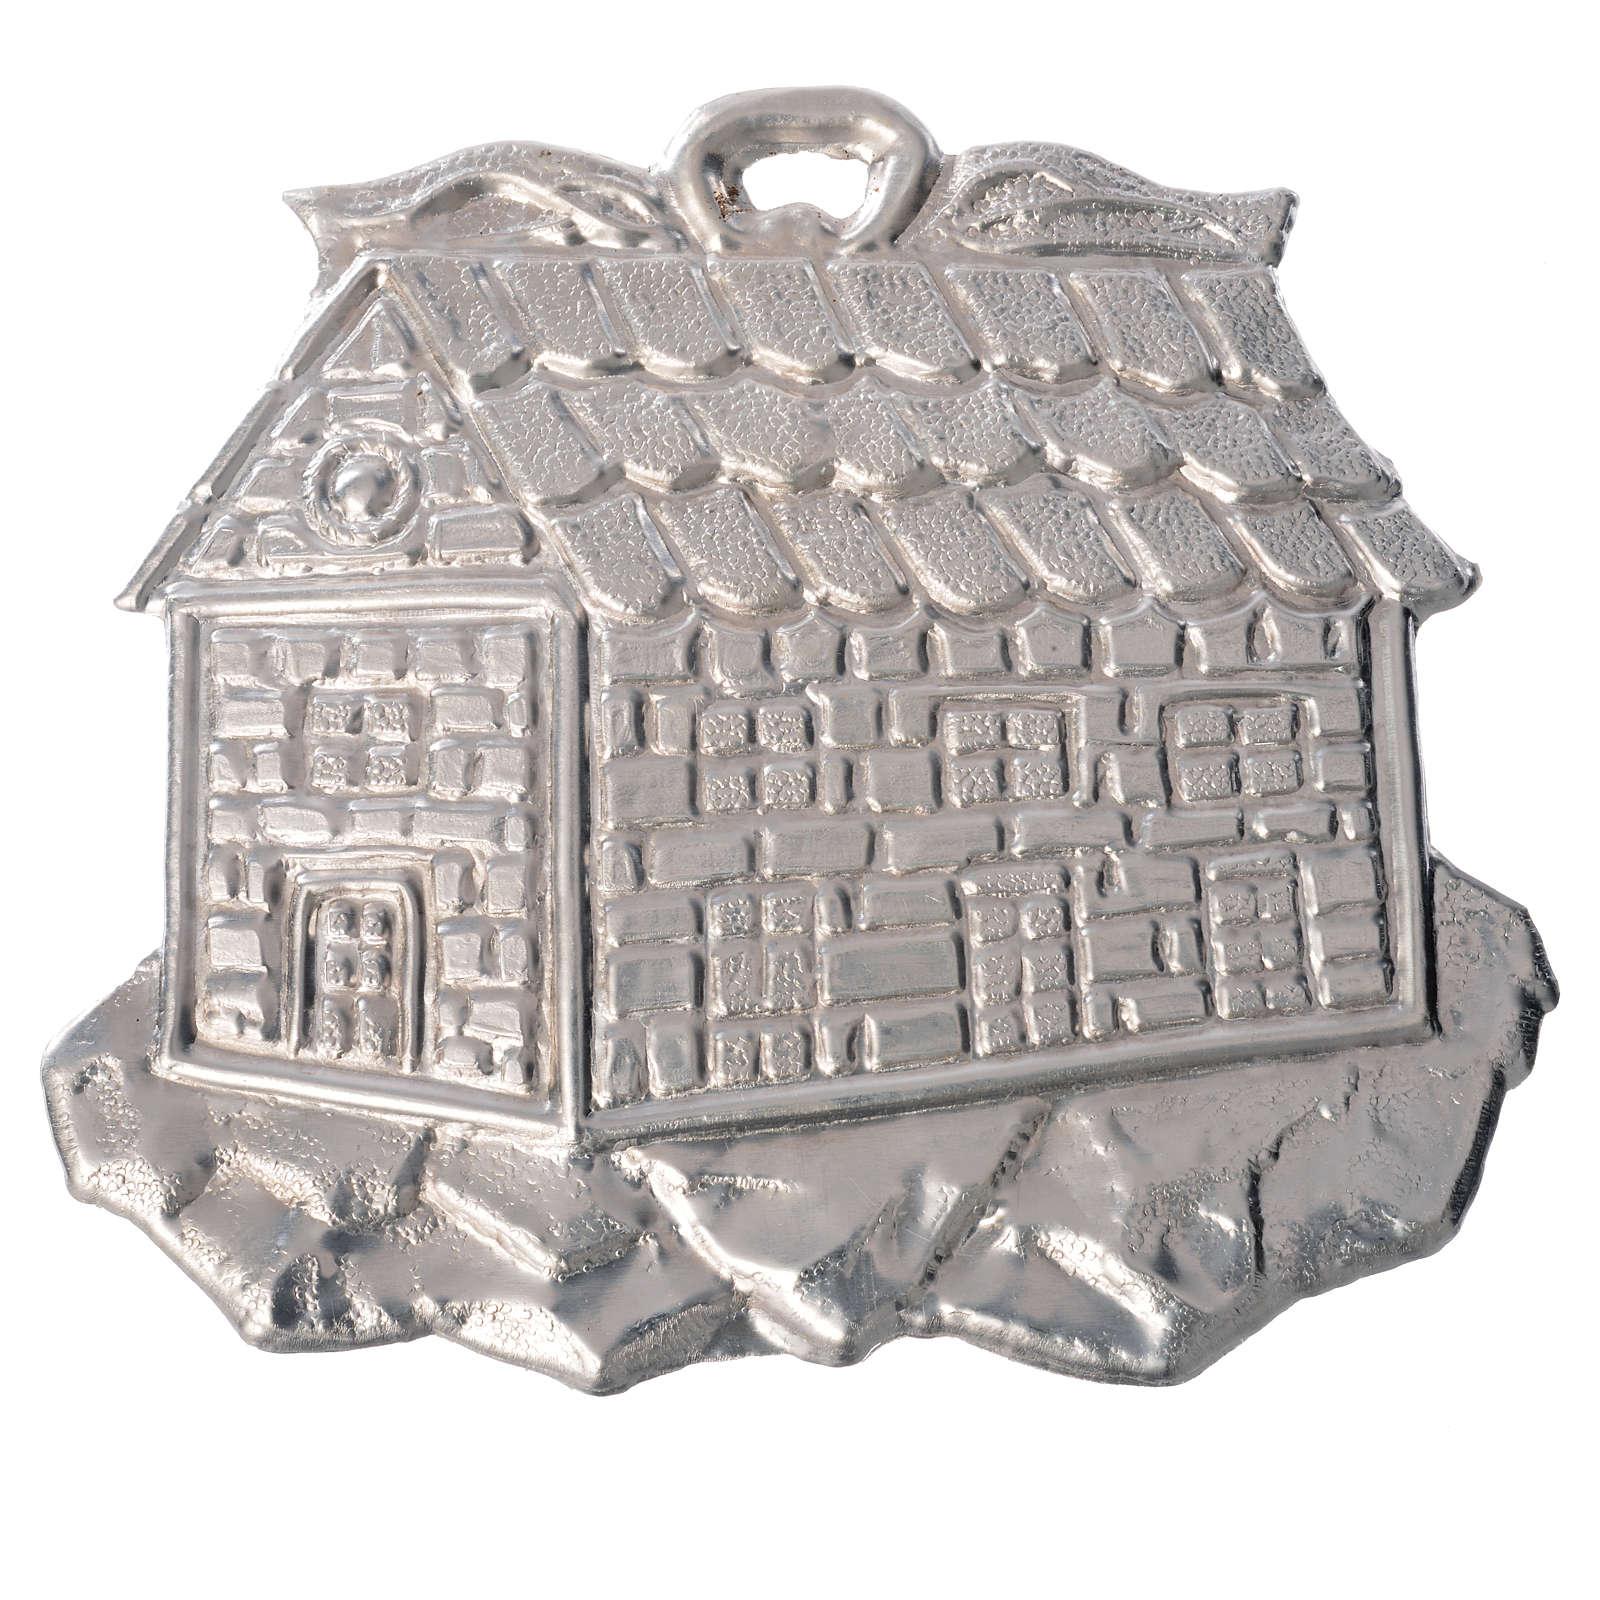 Votivo casetta ex voto argento 925 o metallo 8,5x10 cm 3